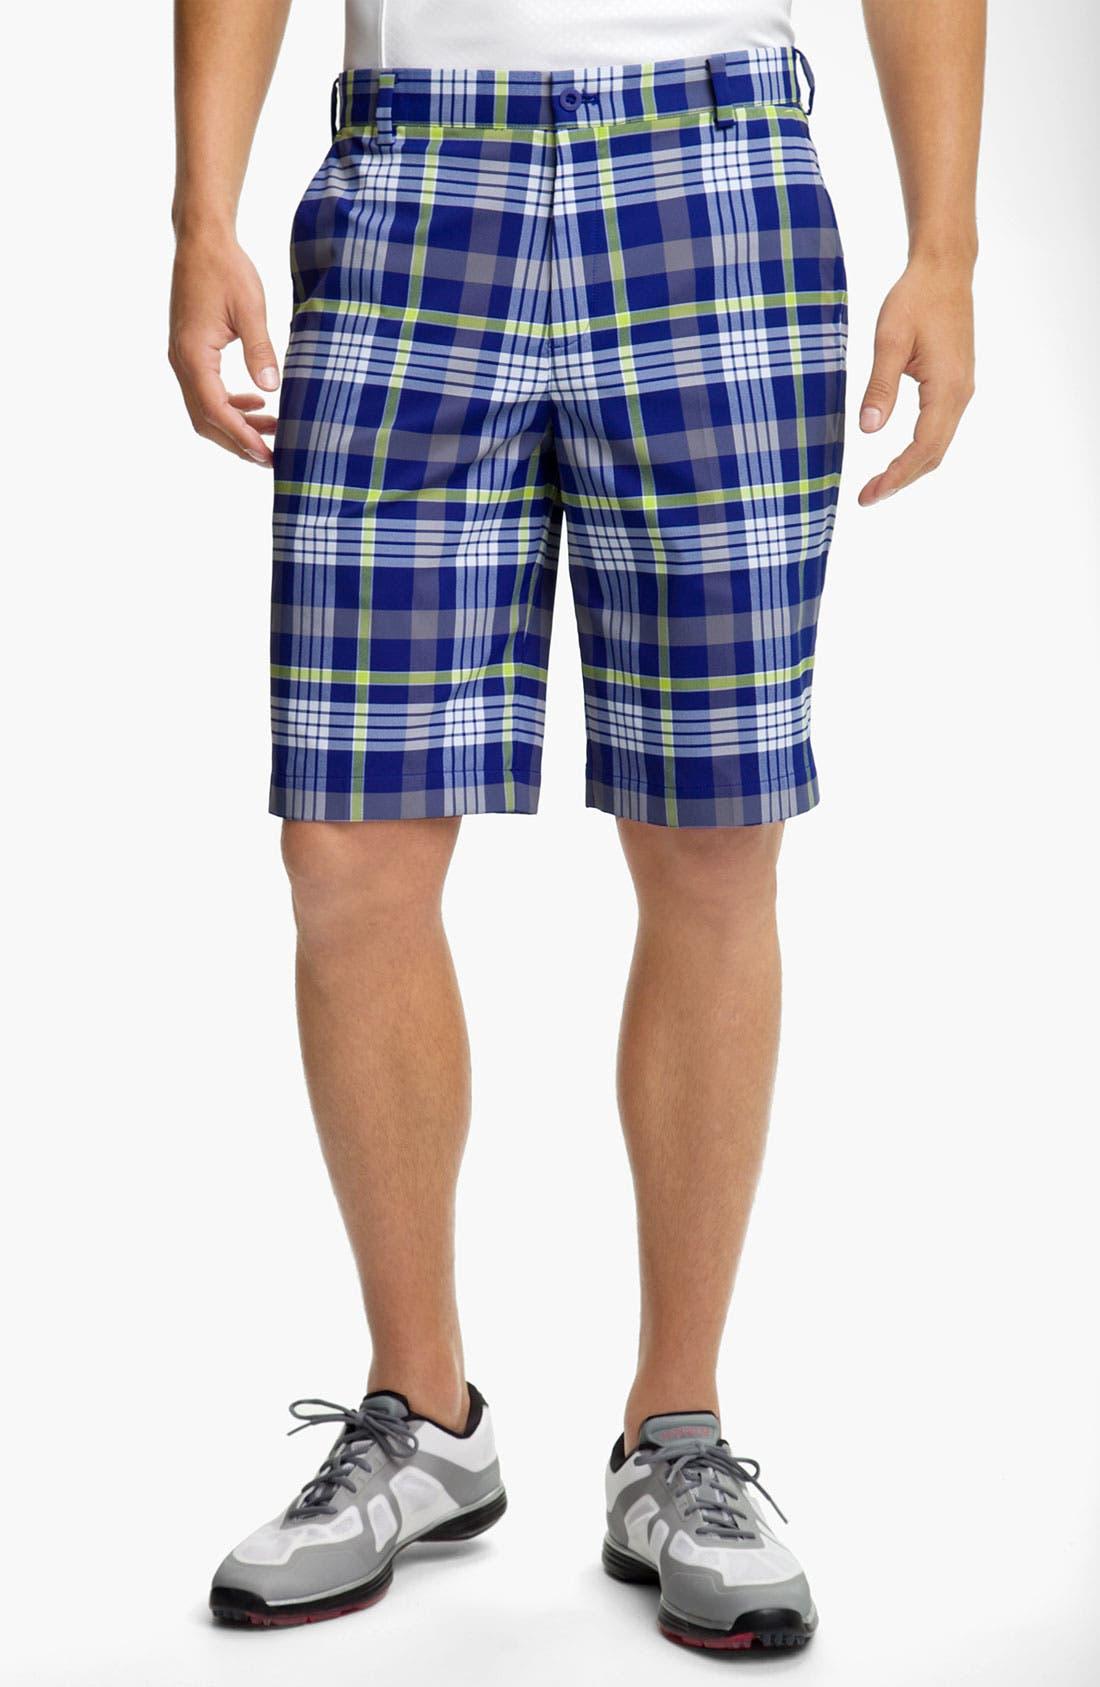 Alternate Image 1 Selected - Nike Golf Dri-FIT Plaid Shorts